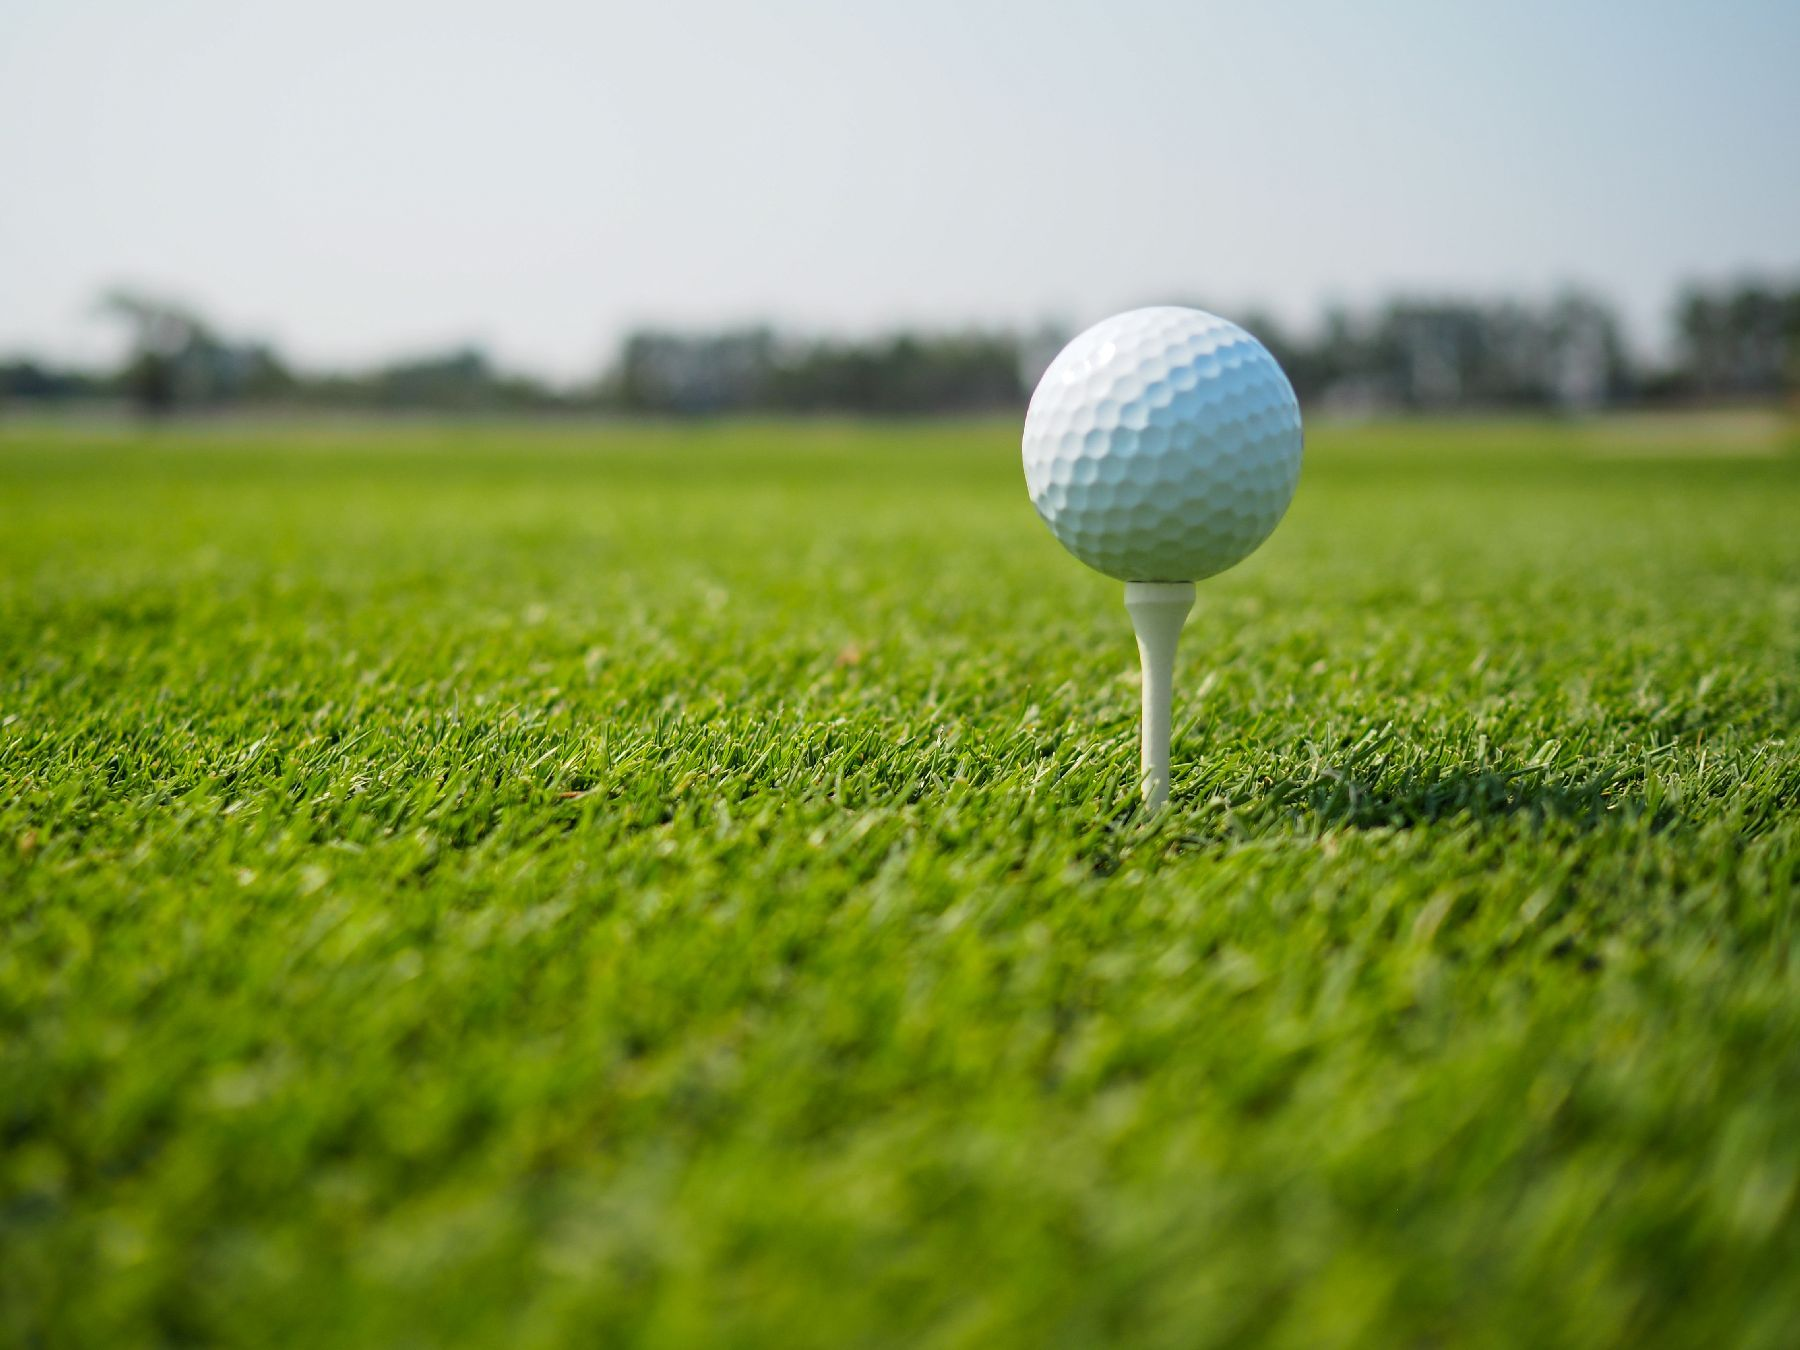 business golf analogy